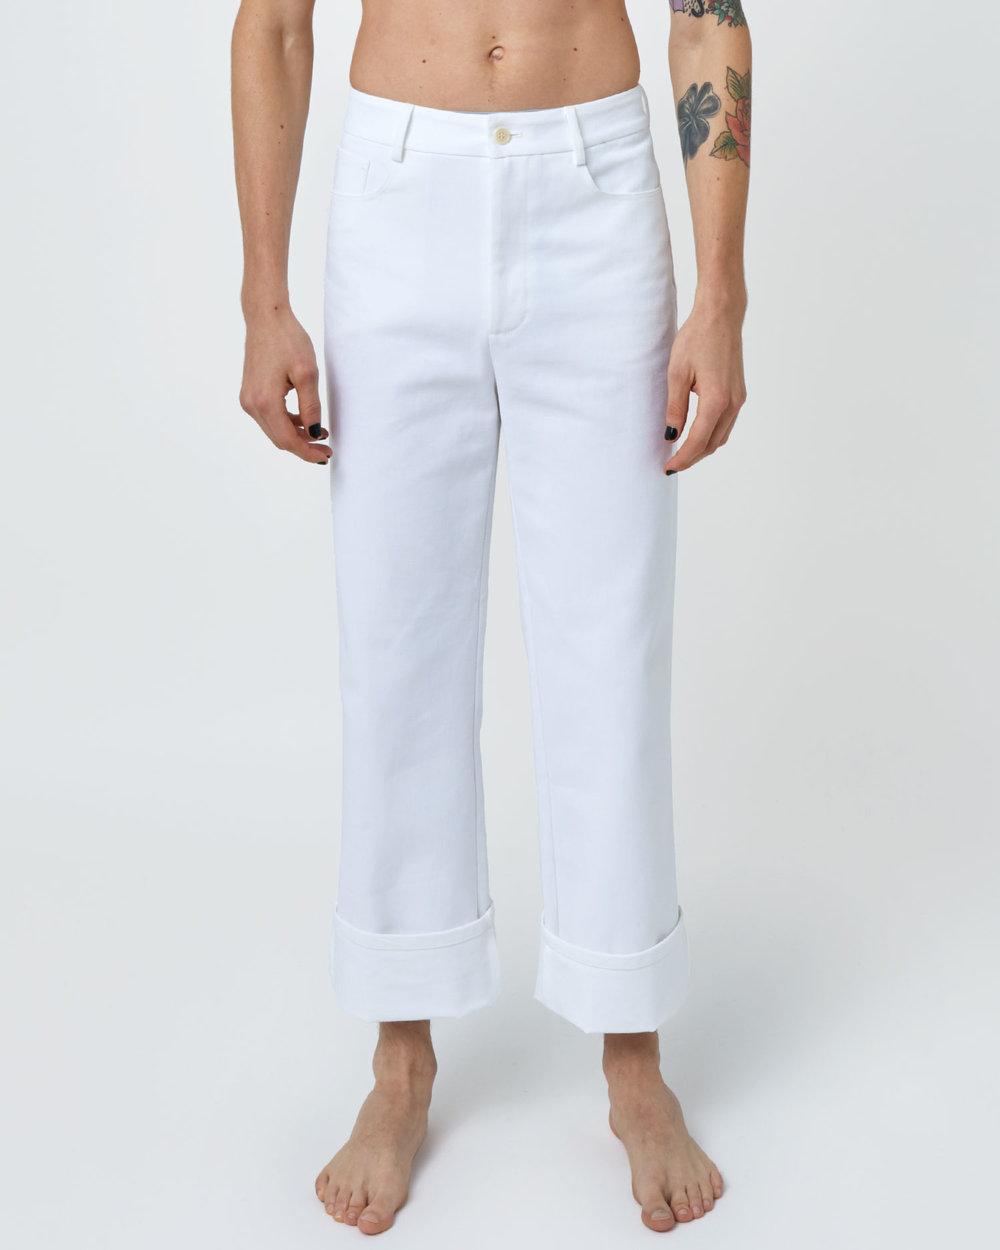 Gender-neutral Jeans by One DNA. Straight-leg, Raw Denim Jean in White.